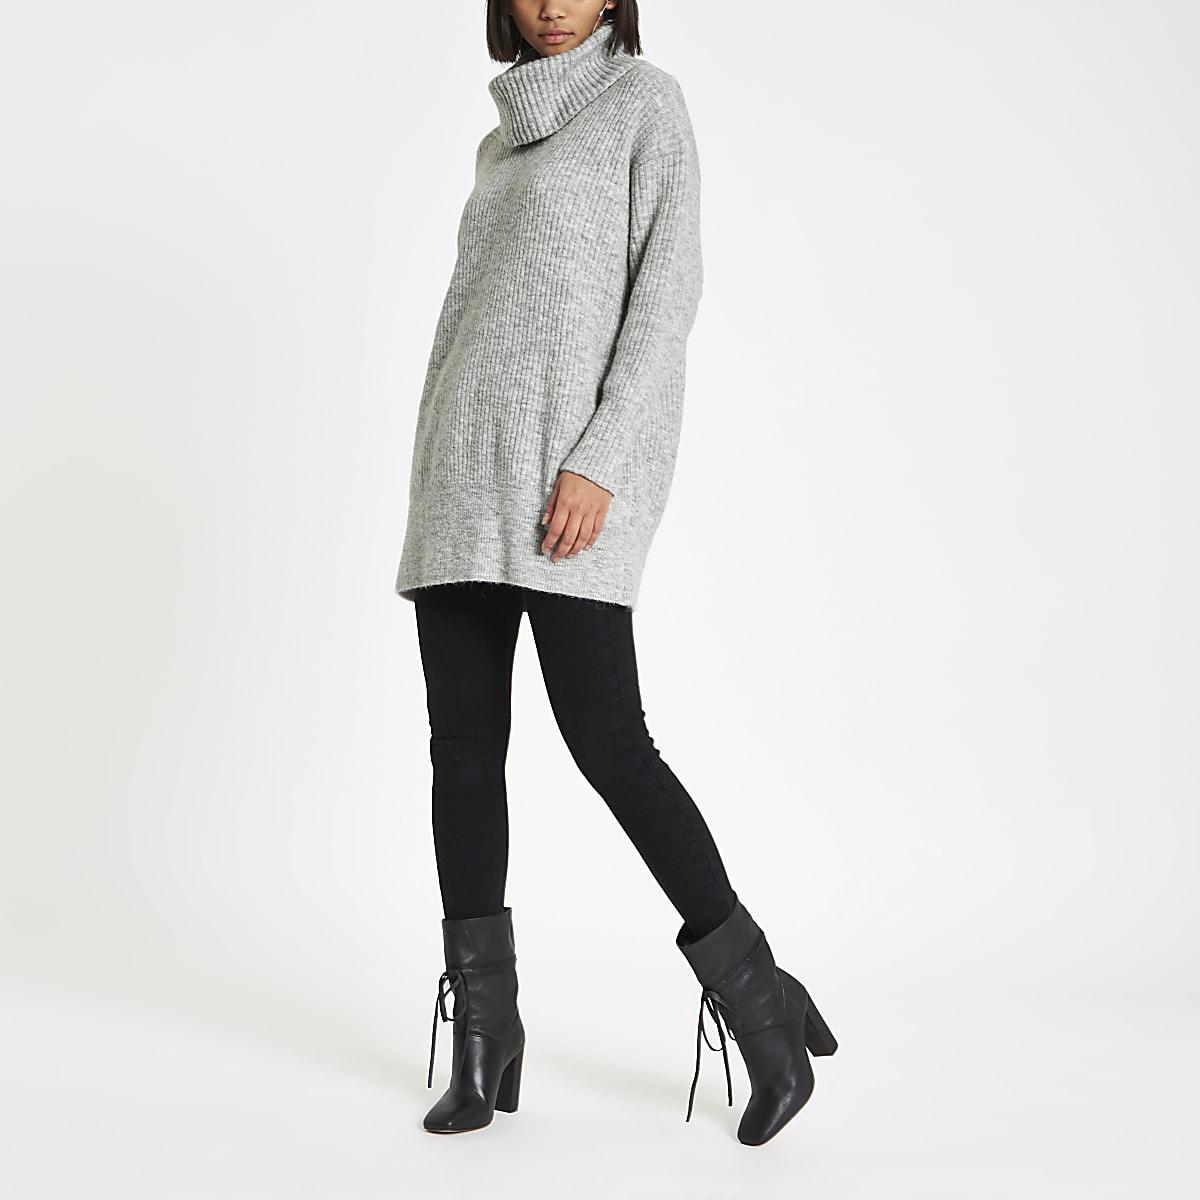 Light grey knit roll neck jumper dress